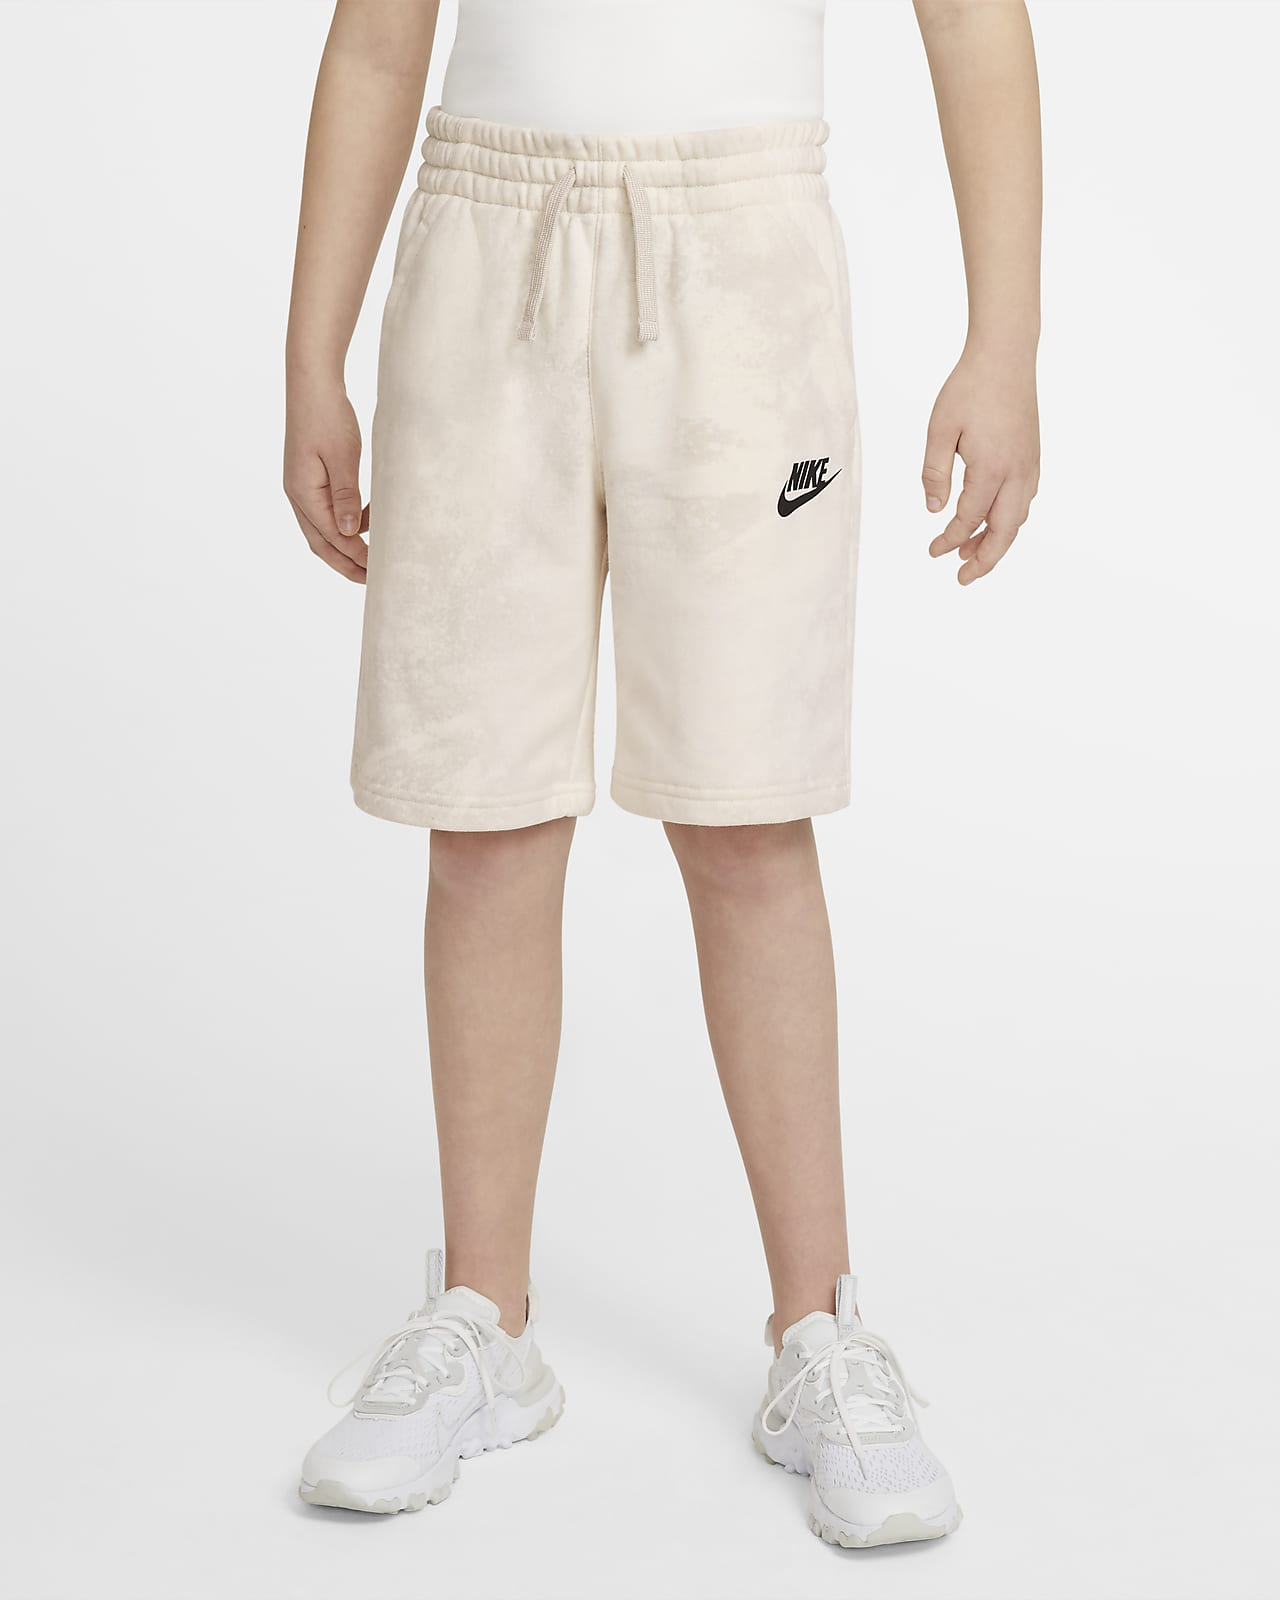 Nike Sportswear Magic Club Older Kids' (Boys') Tie-Dye Shorts